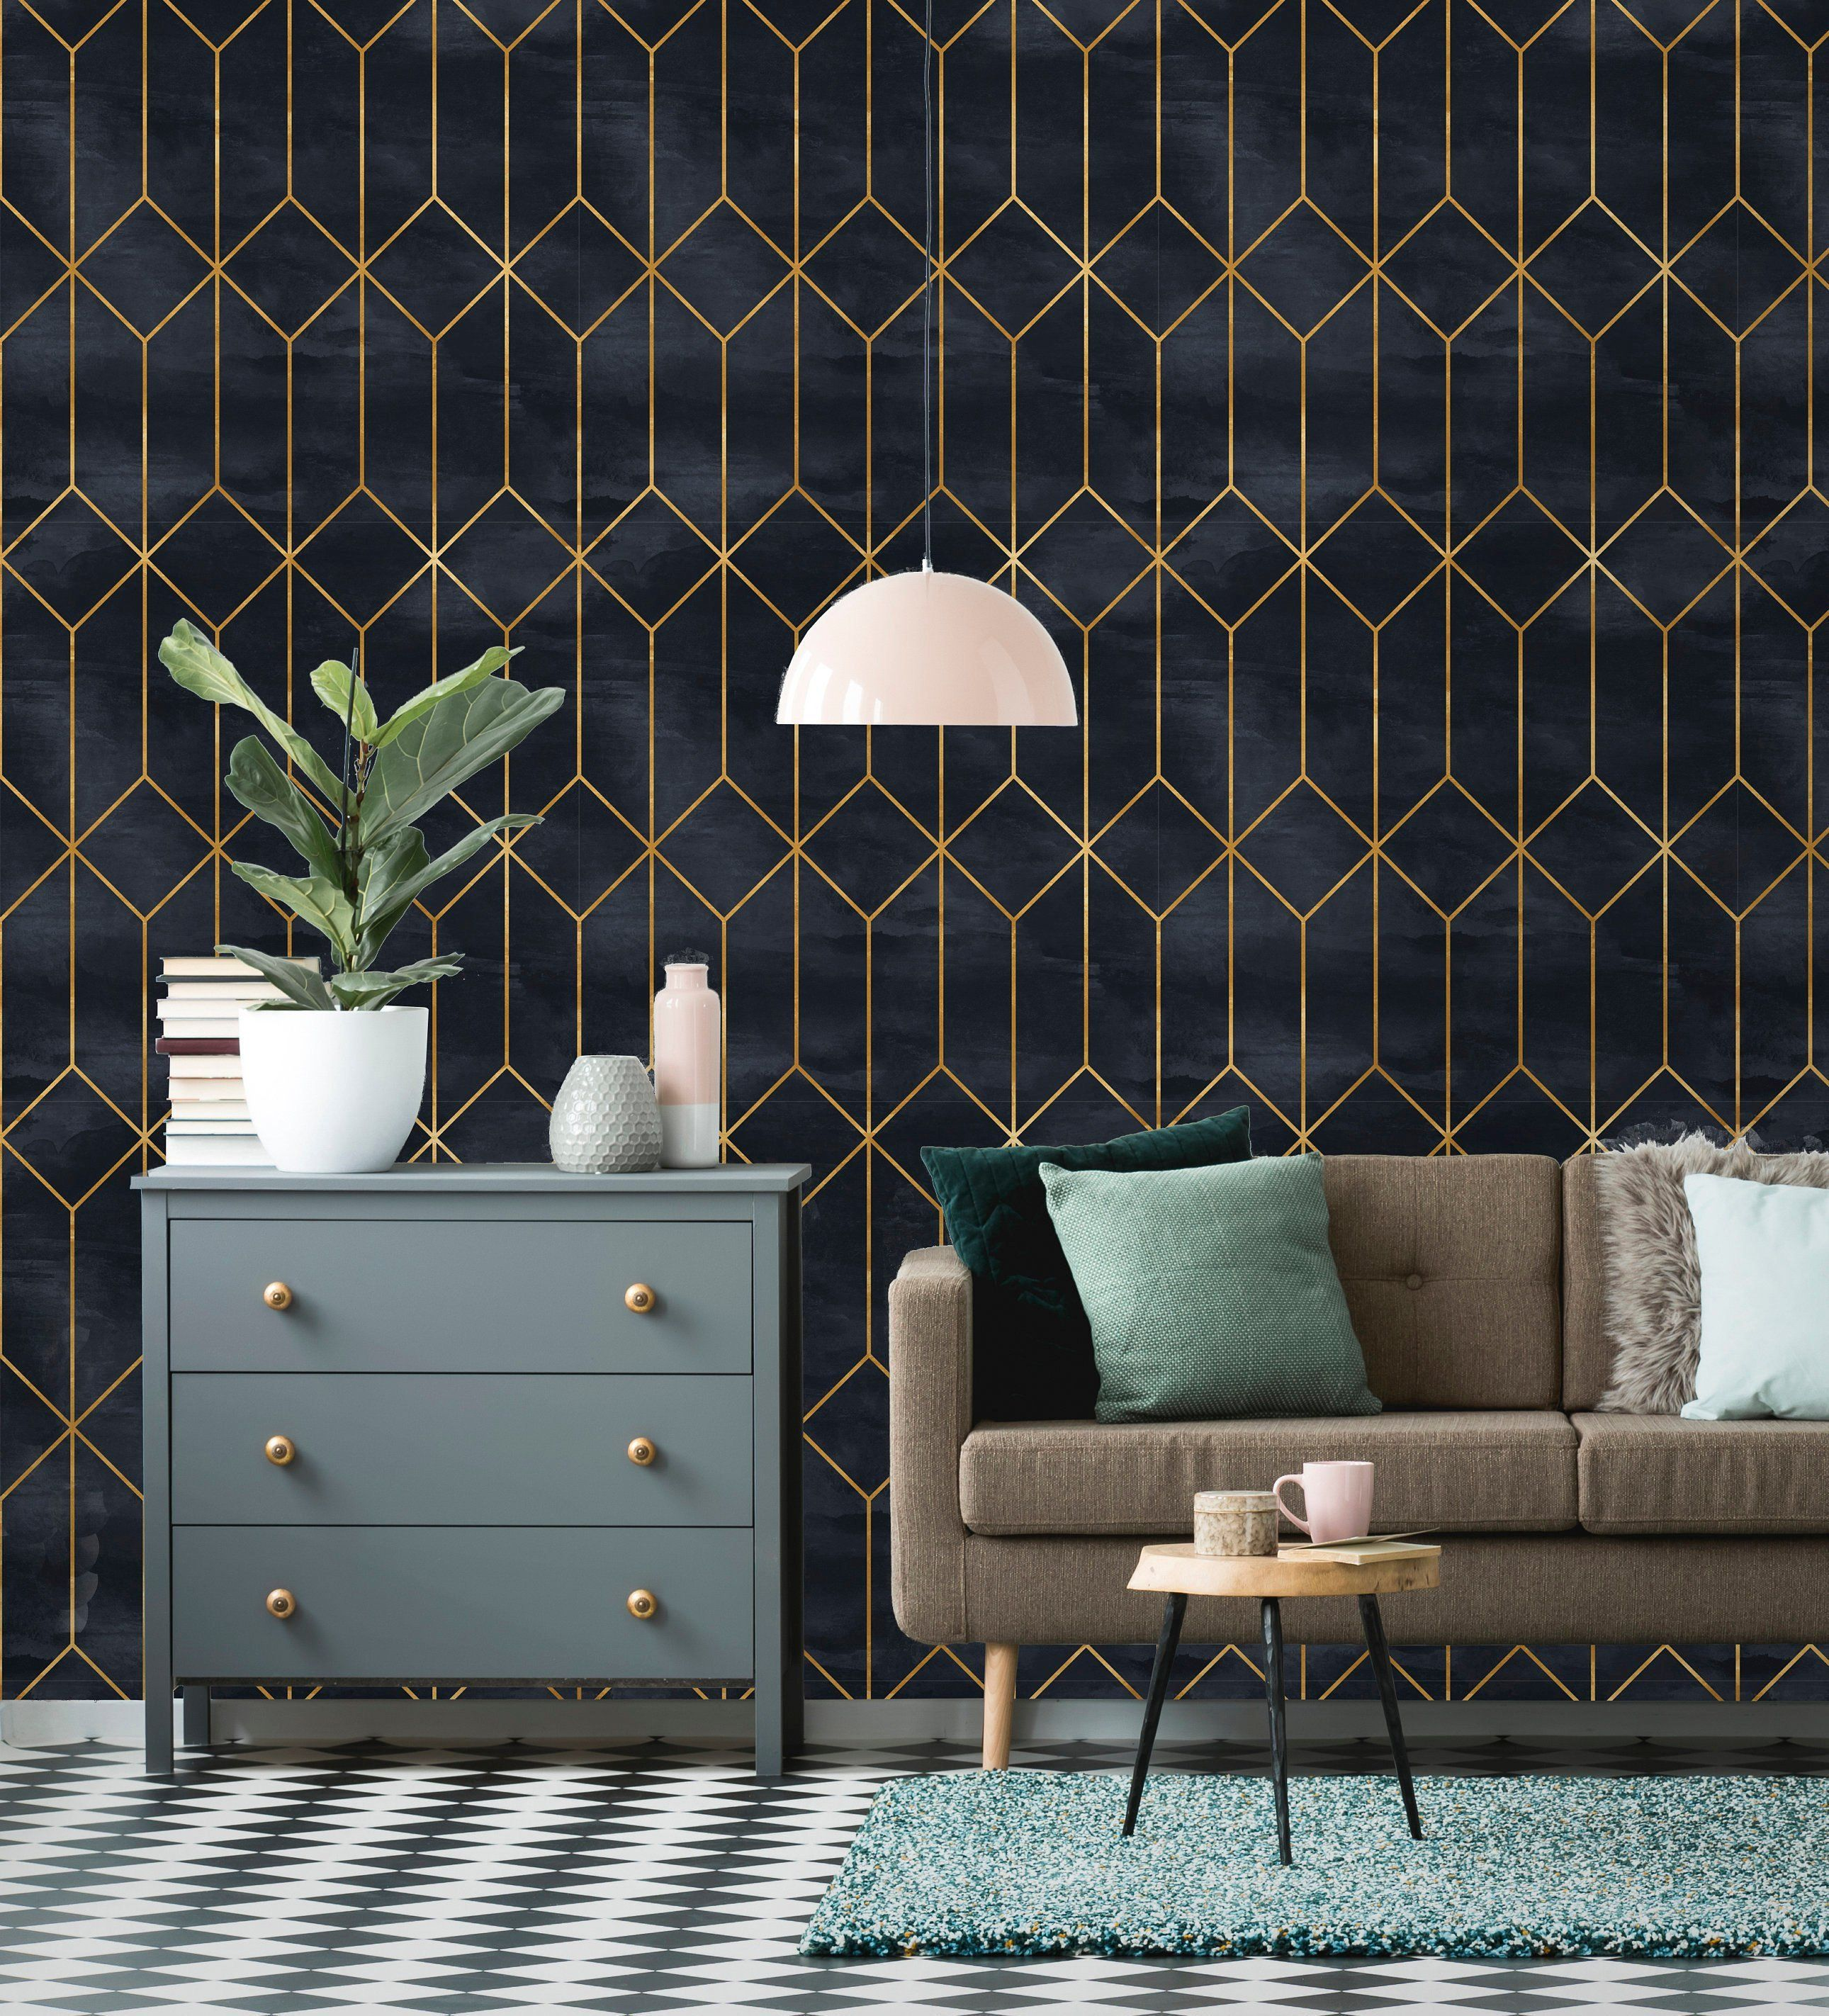 Removable Wallpaper Peel And Stick Geometric Wallpaper Etsy Art Deco Wallpaper Interior Deco Geometric Wallpaper